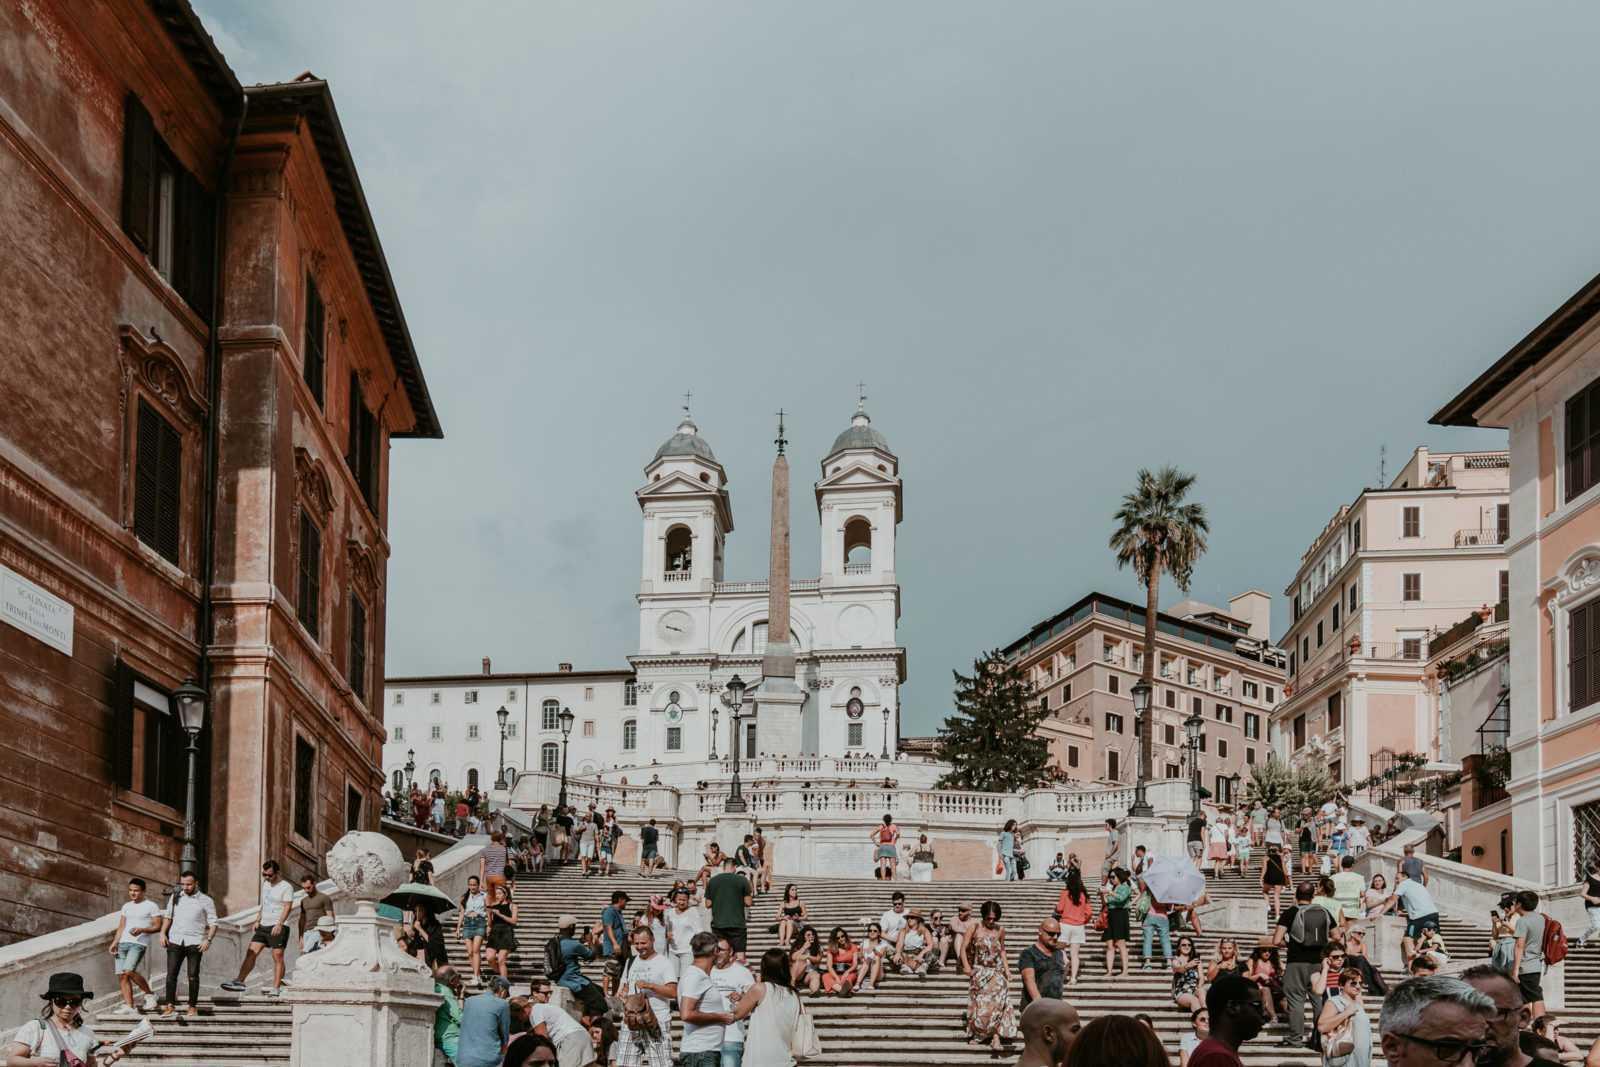 spanische treppe rom